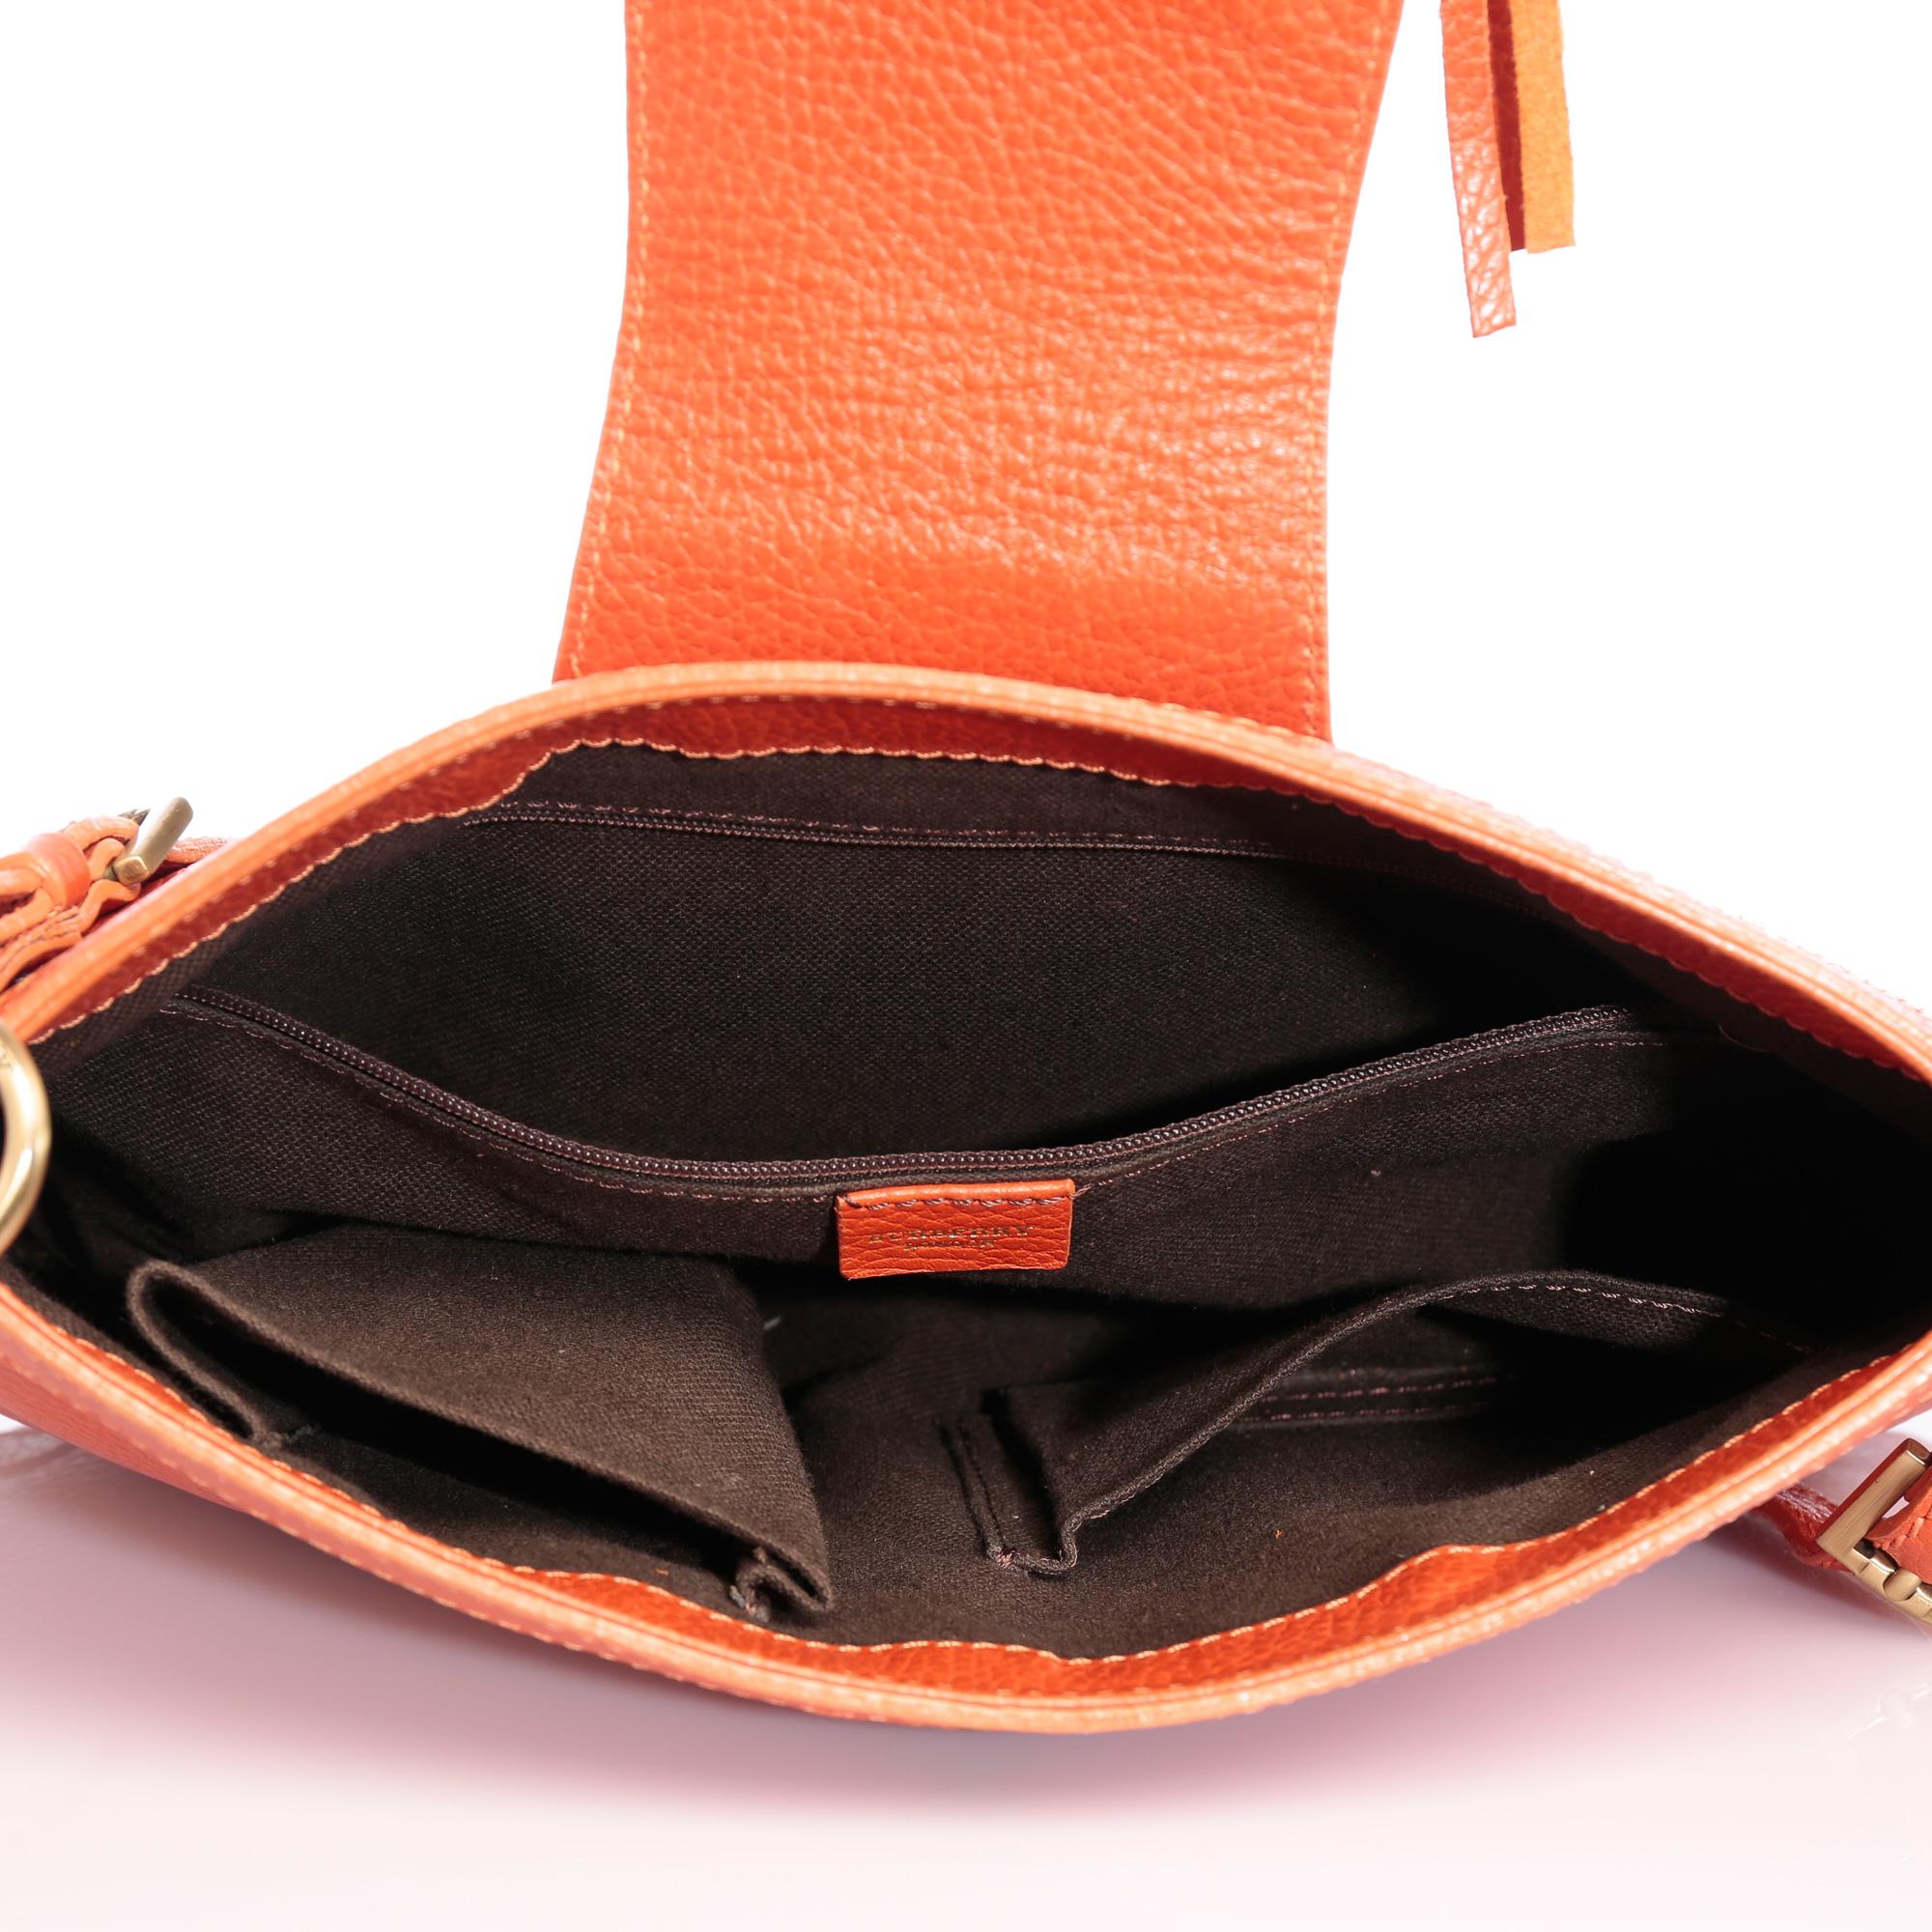 28bba268465c Shop Authentic Burberry Handbag Online india My Luxury Bargain Burberry  Orange Leather Shoulder Bag ...